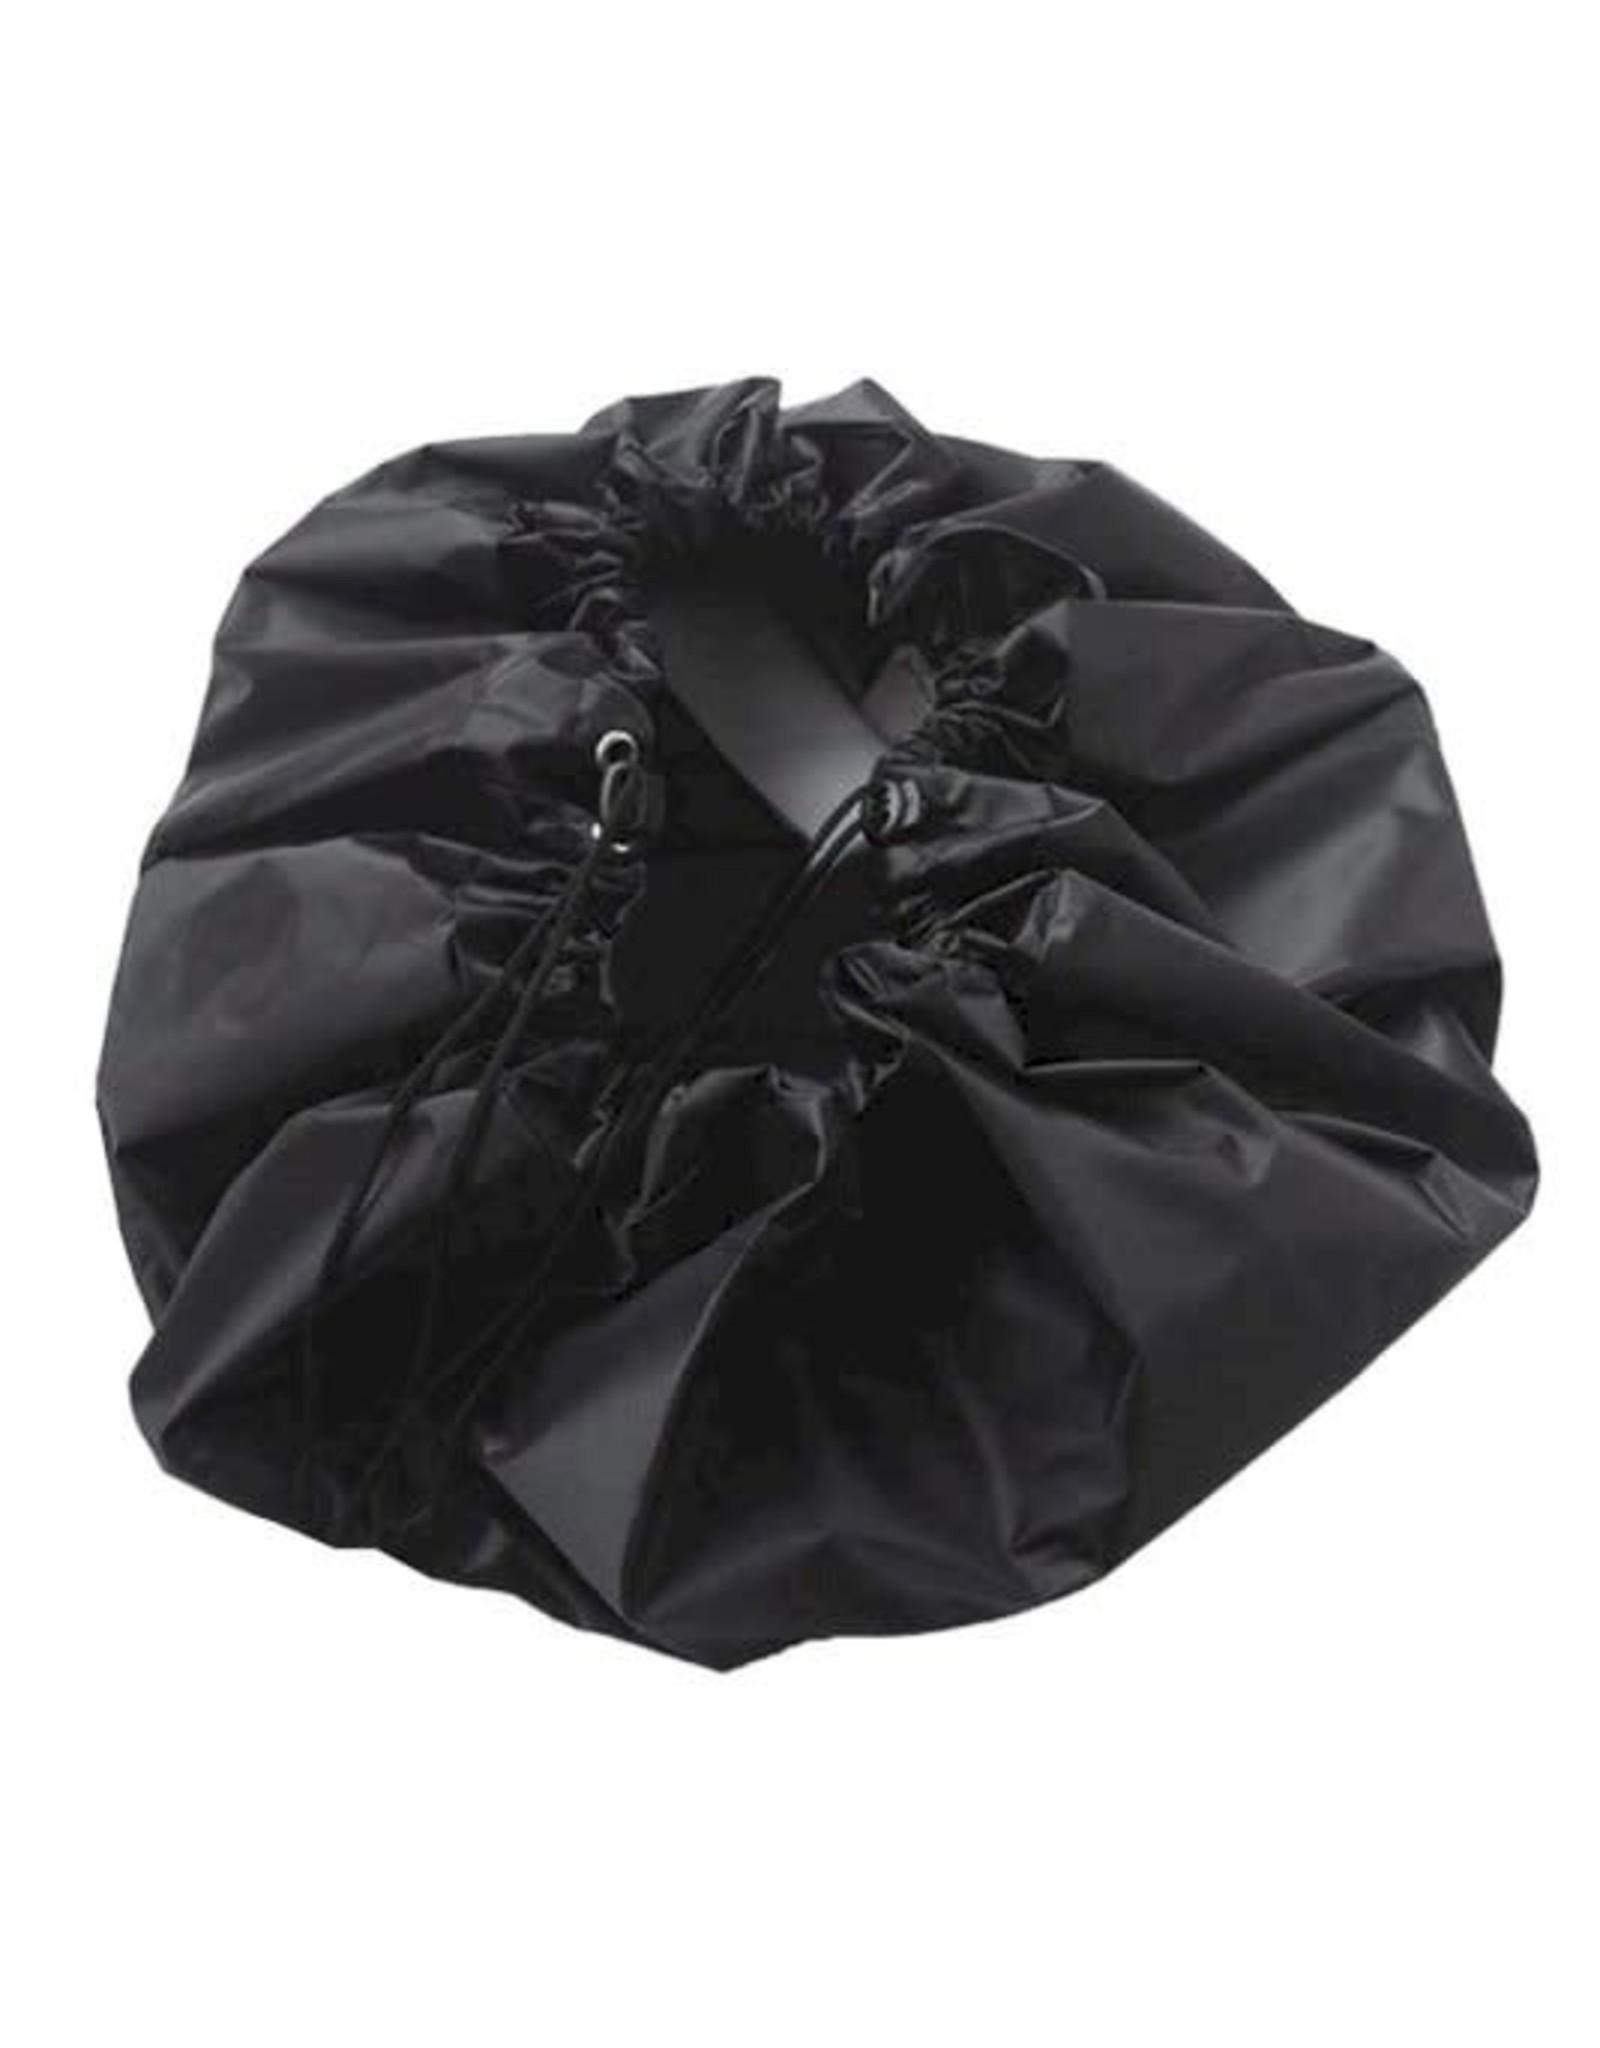 Madness Madnes Neopren Changing Bag Mat